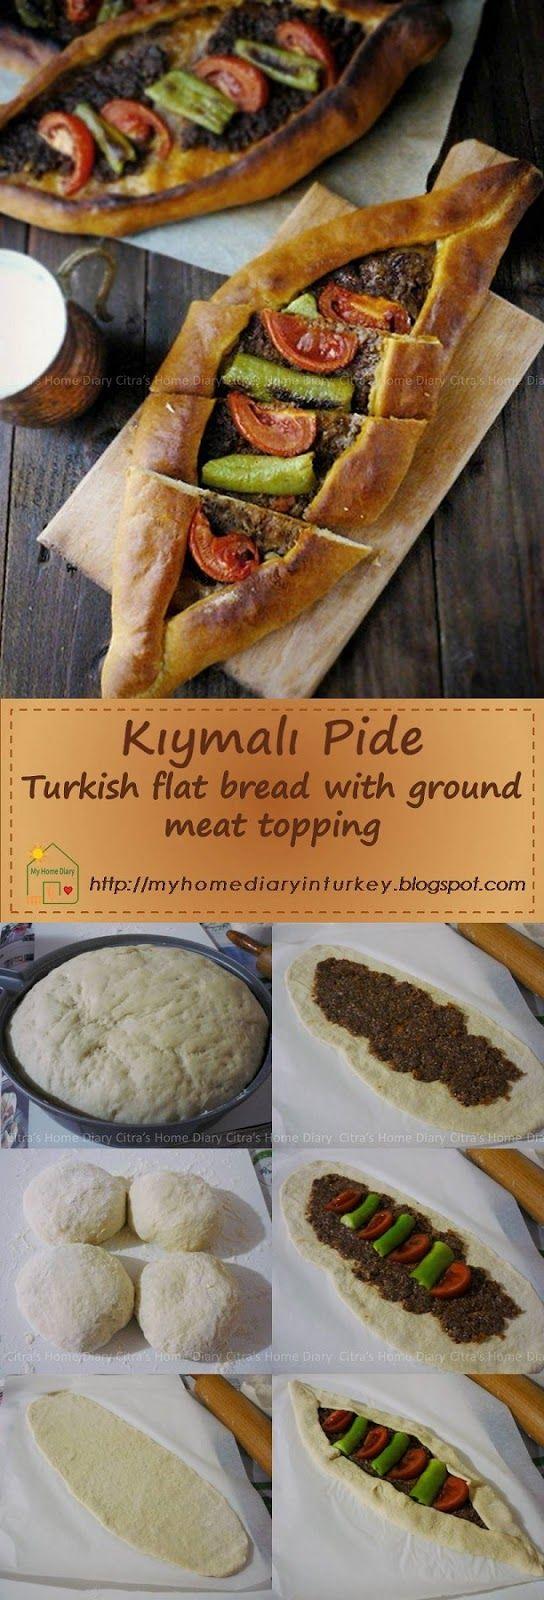 Food blog family tips turkey indonesian in turkey turkish food mediterranean food forumfinder Gallery